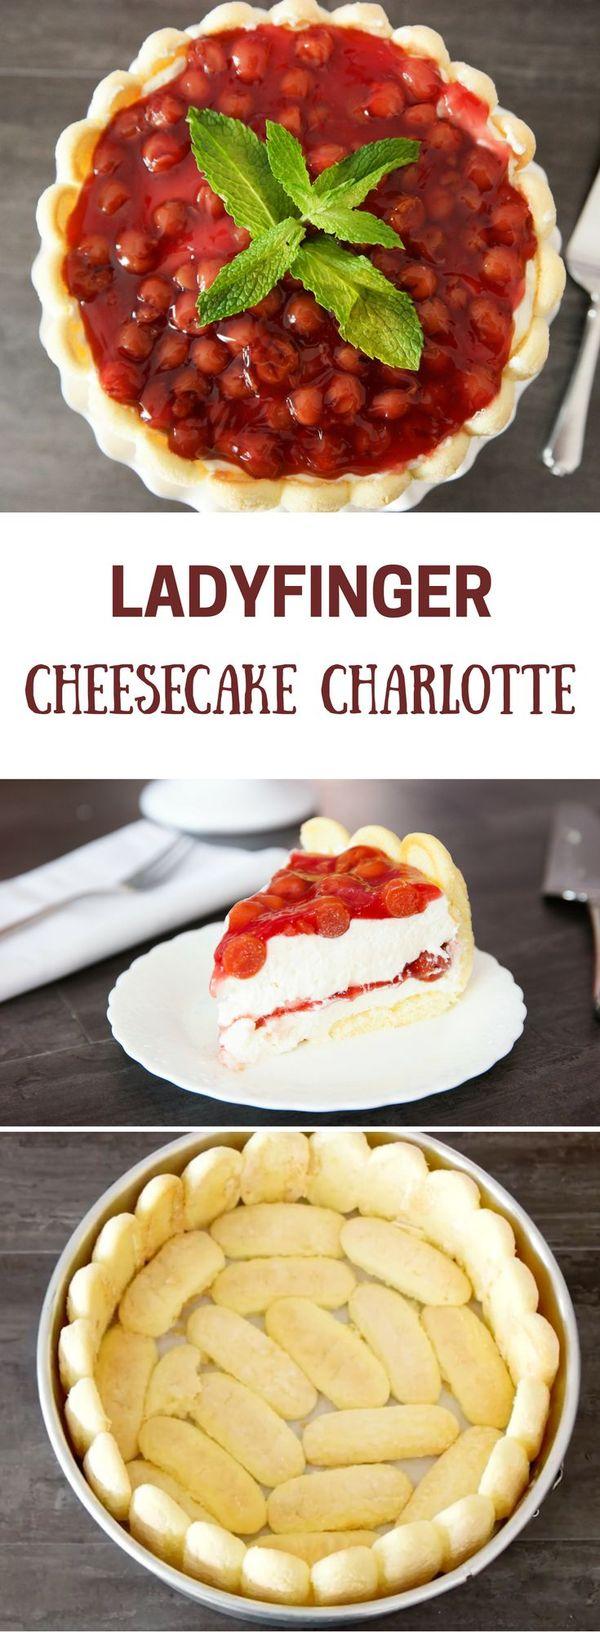 Ladyfinger Cheesecake Charlotte